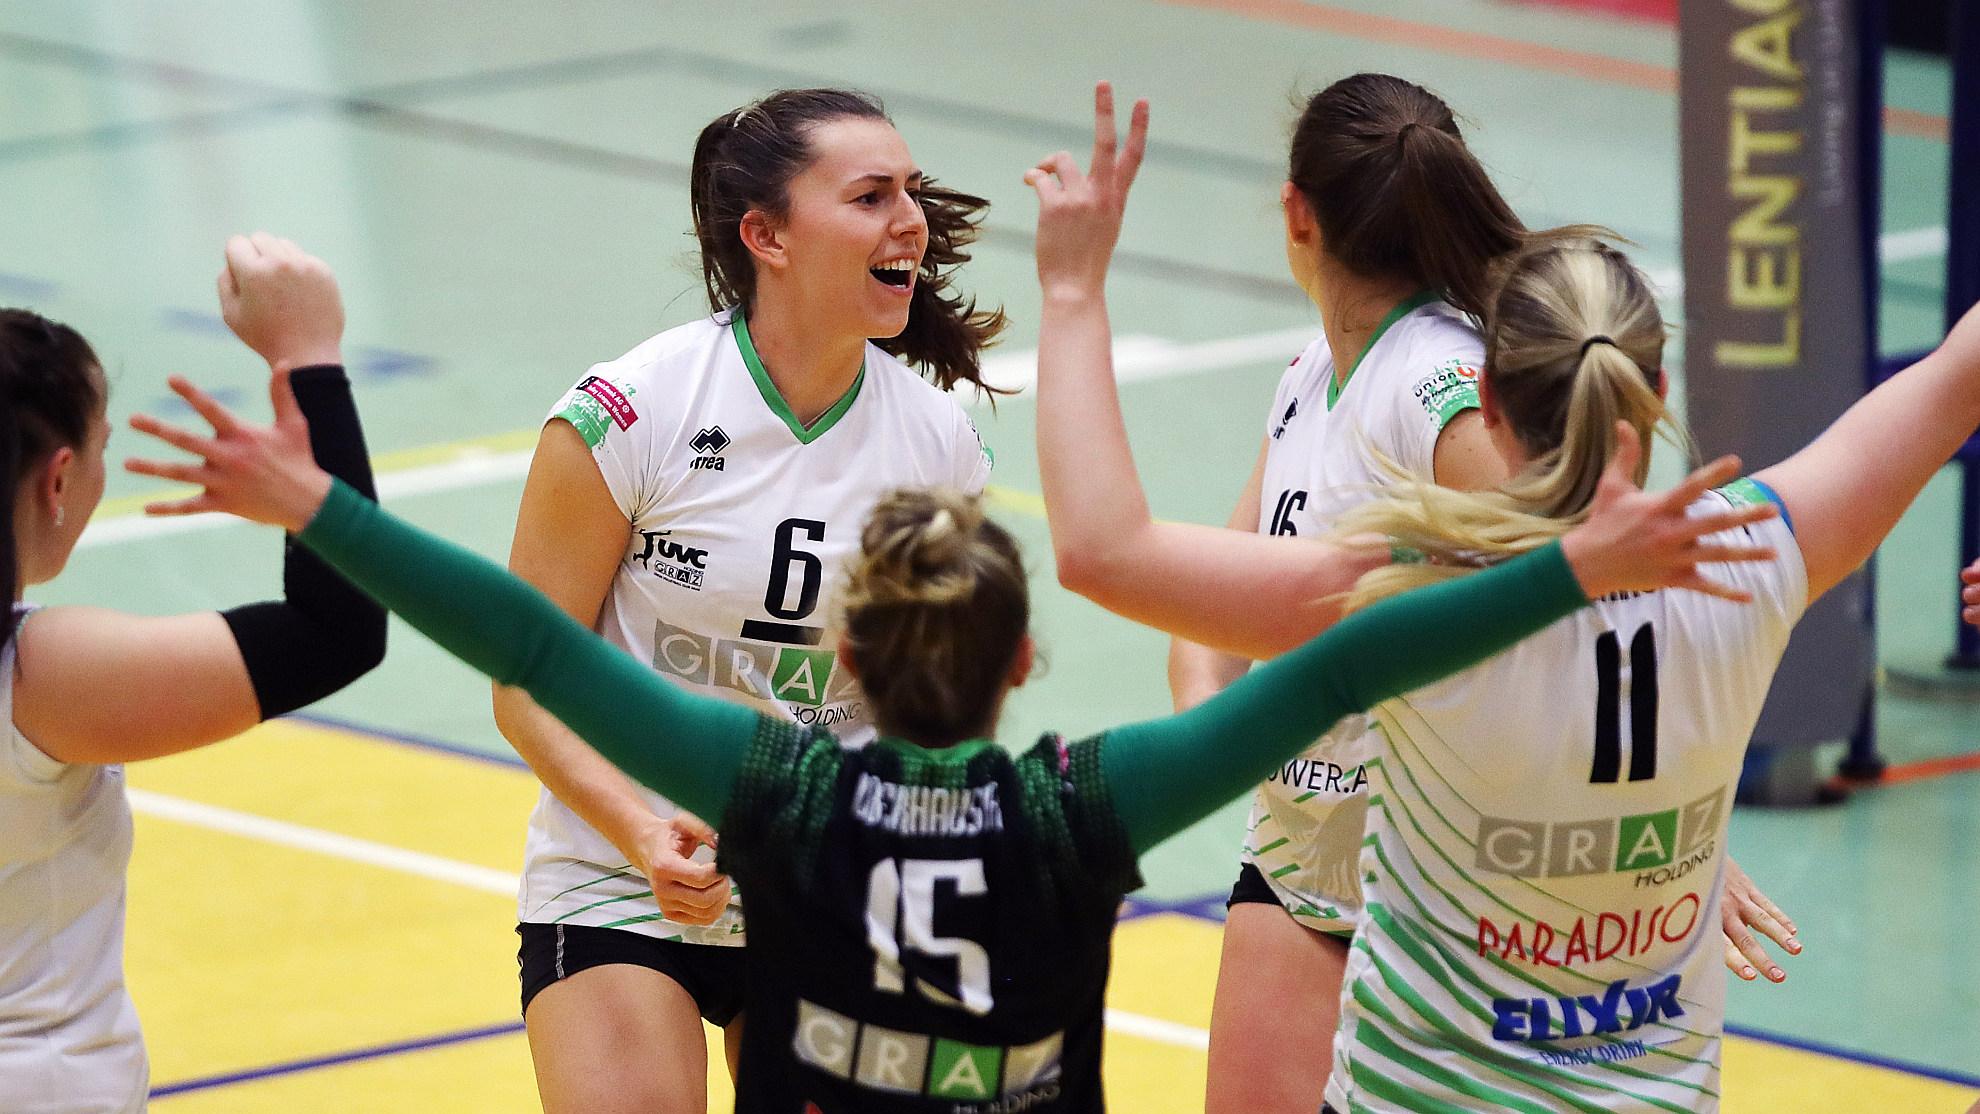 UVC Holding Graz 2020 - FOTO © GEPA pictures/Matthias Hauer